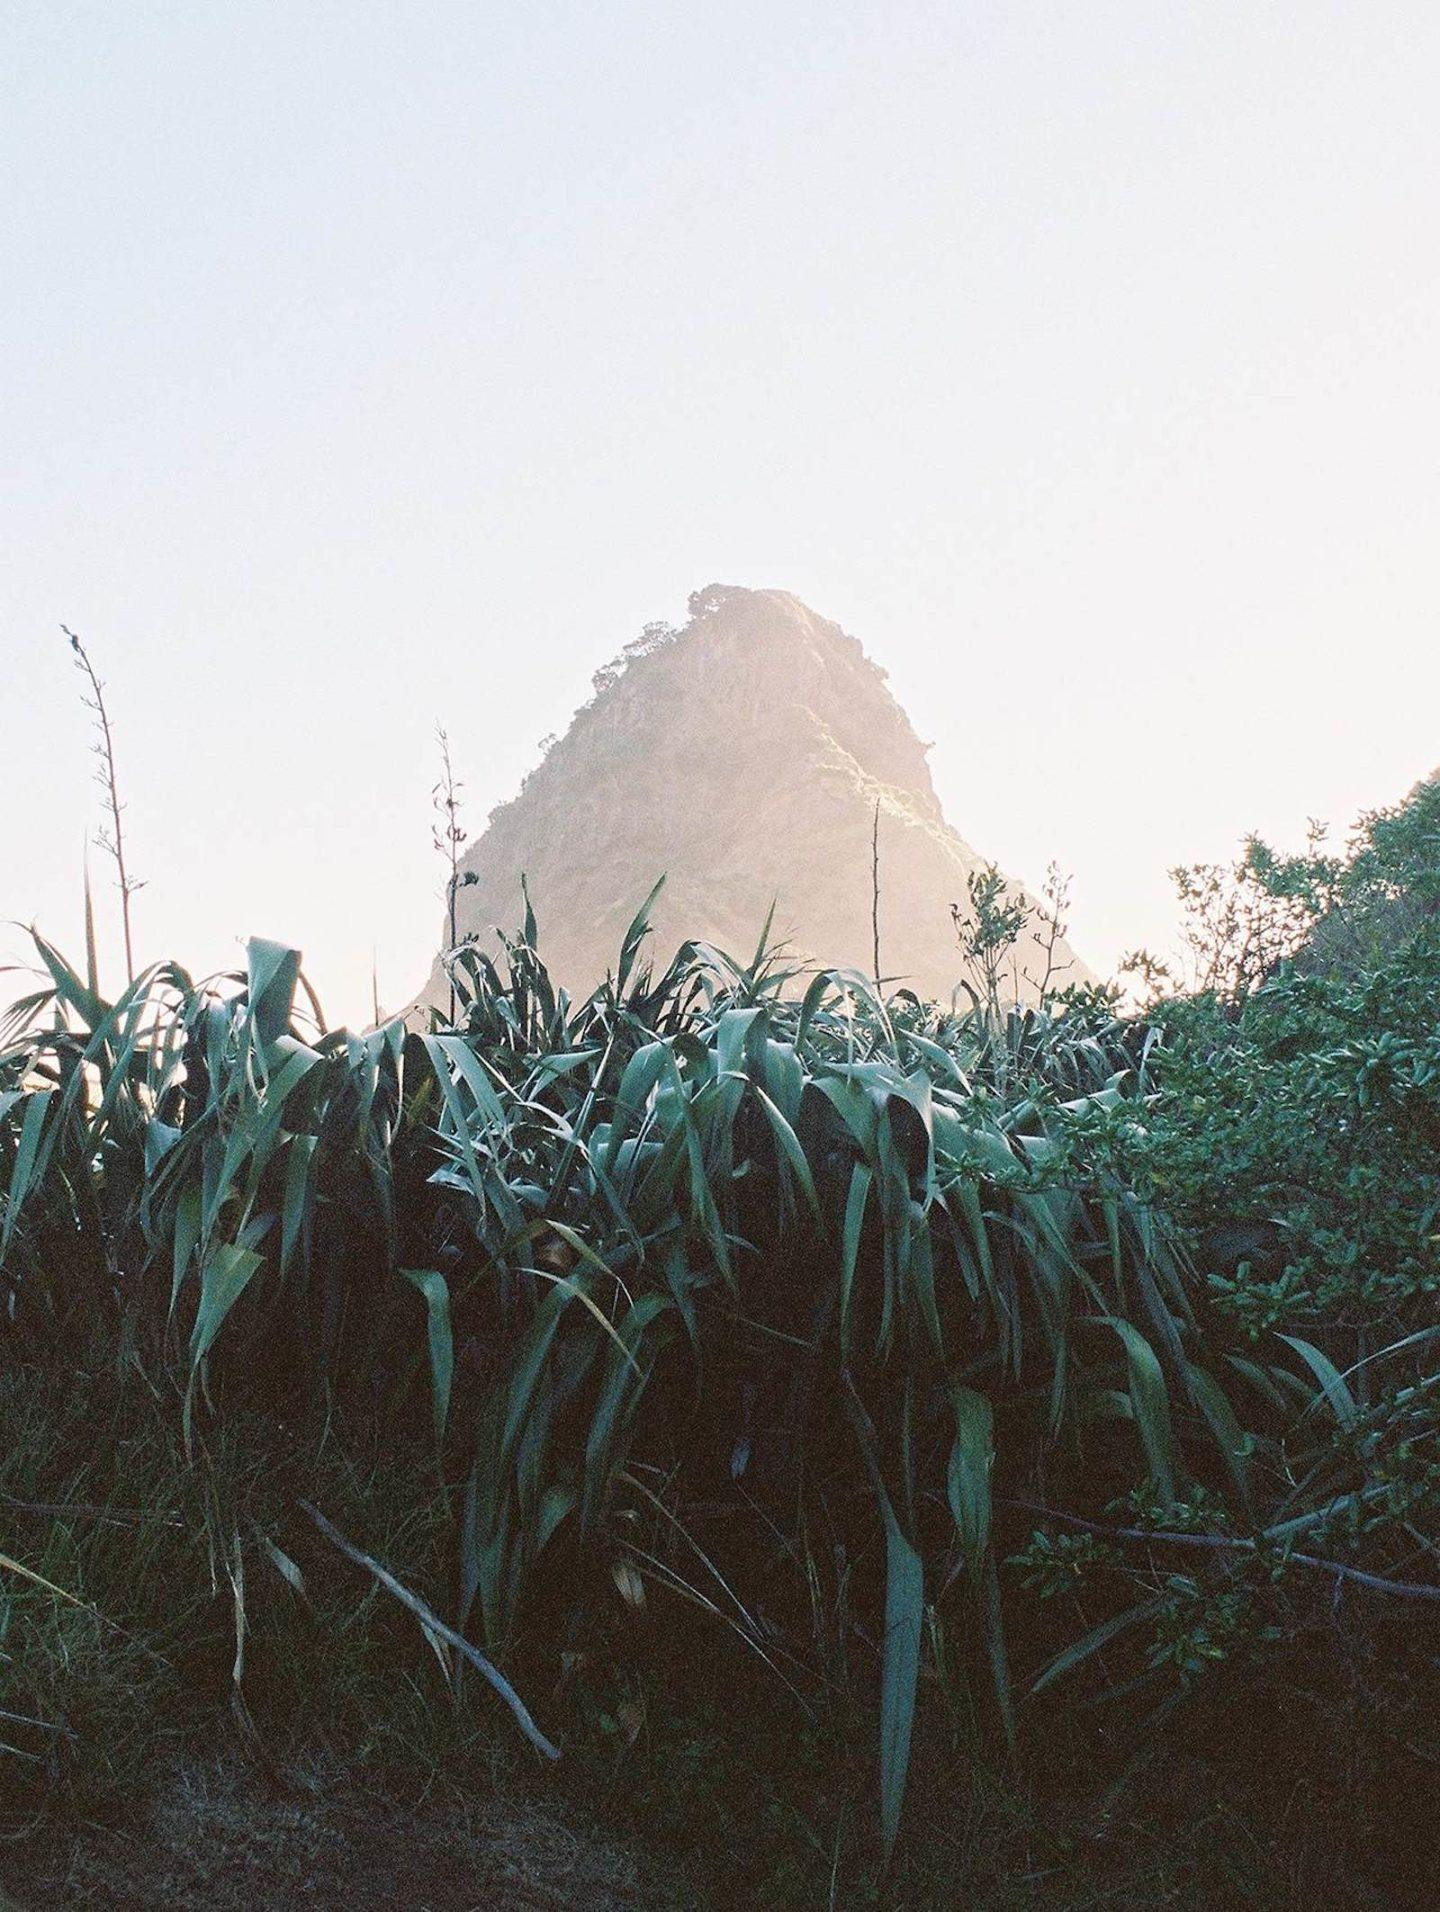 IGNANT-Photography-Chiara-Zonca-It-Devours-011